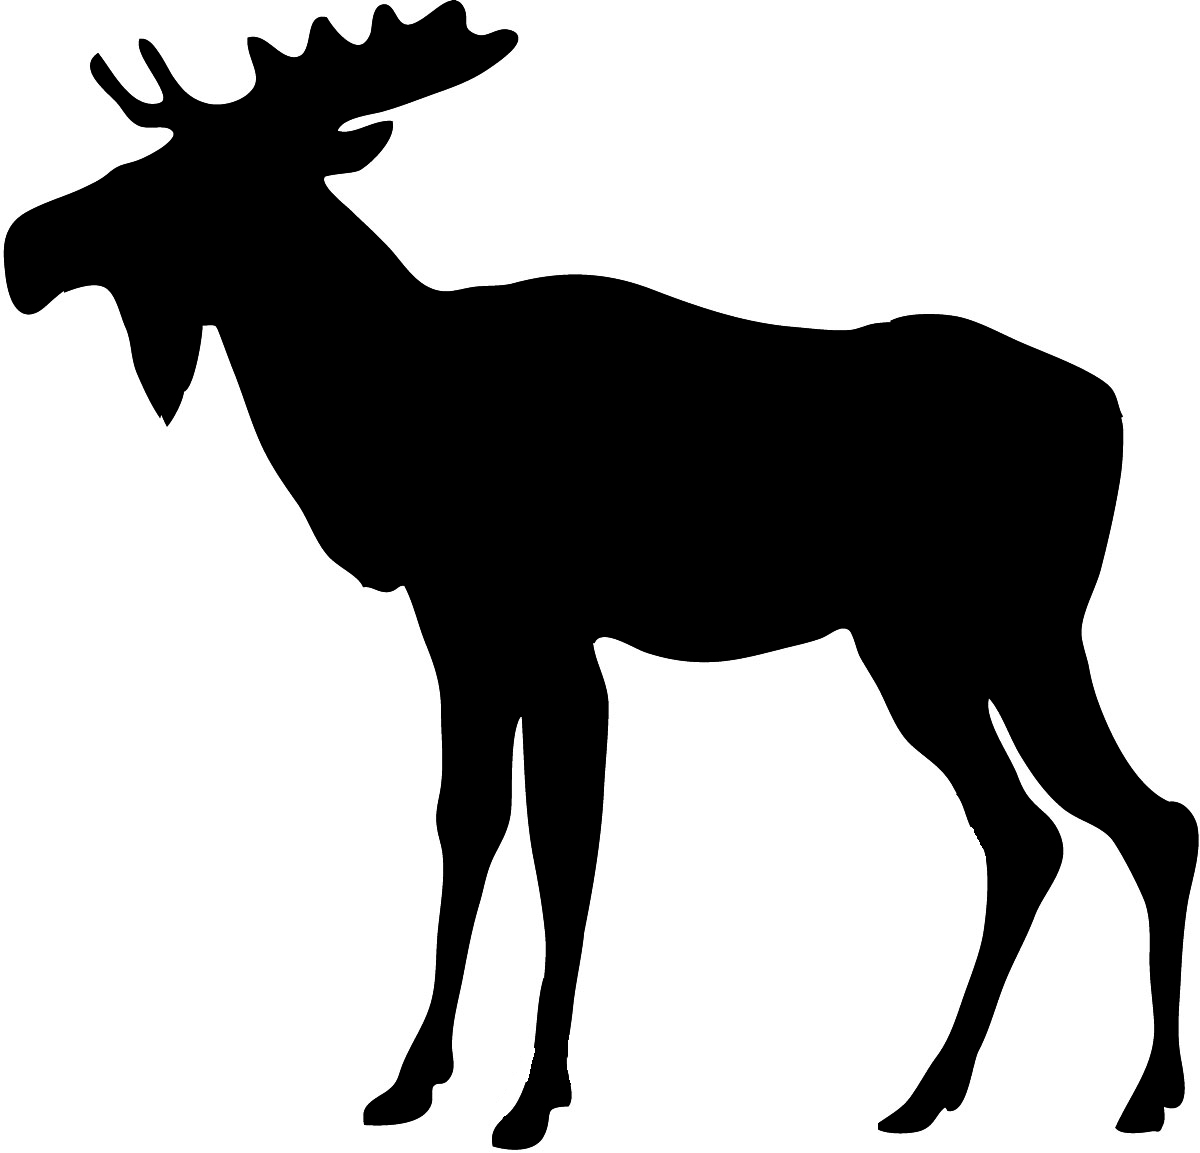 Elk Silhouette Images